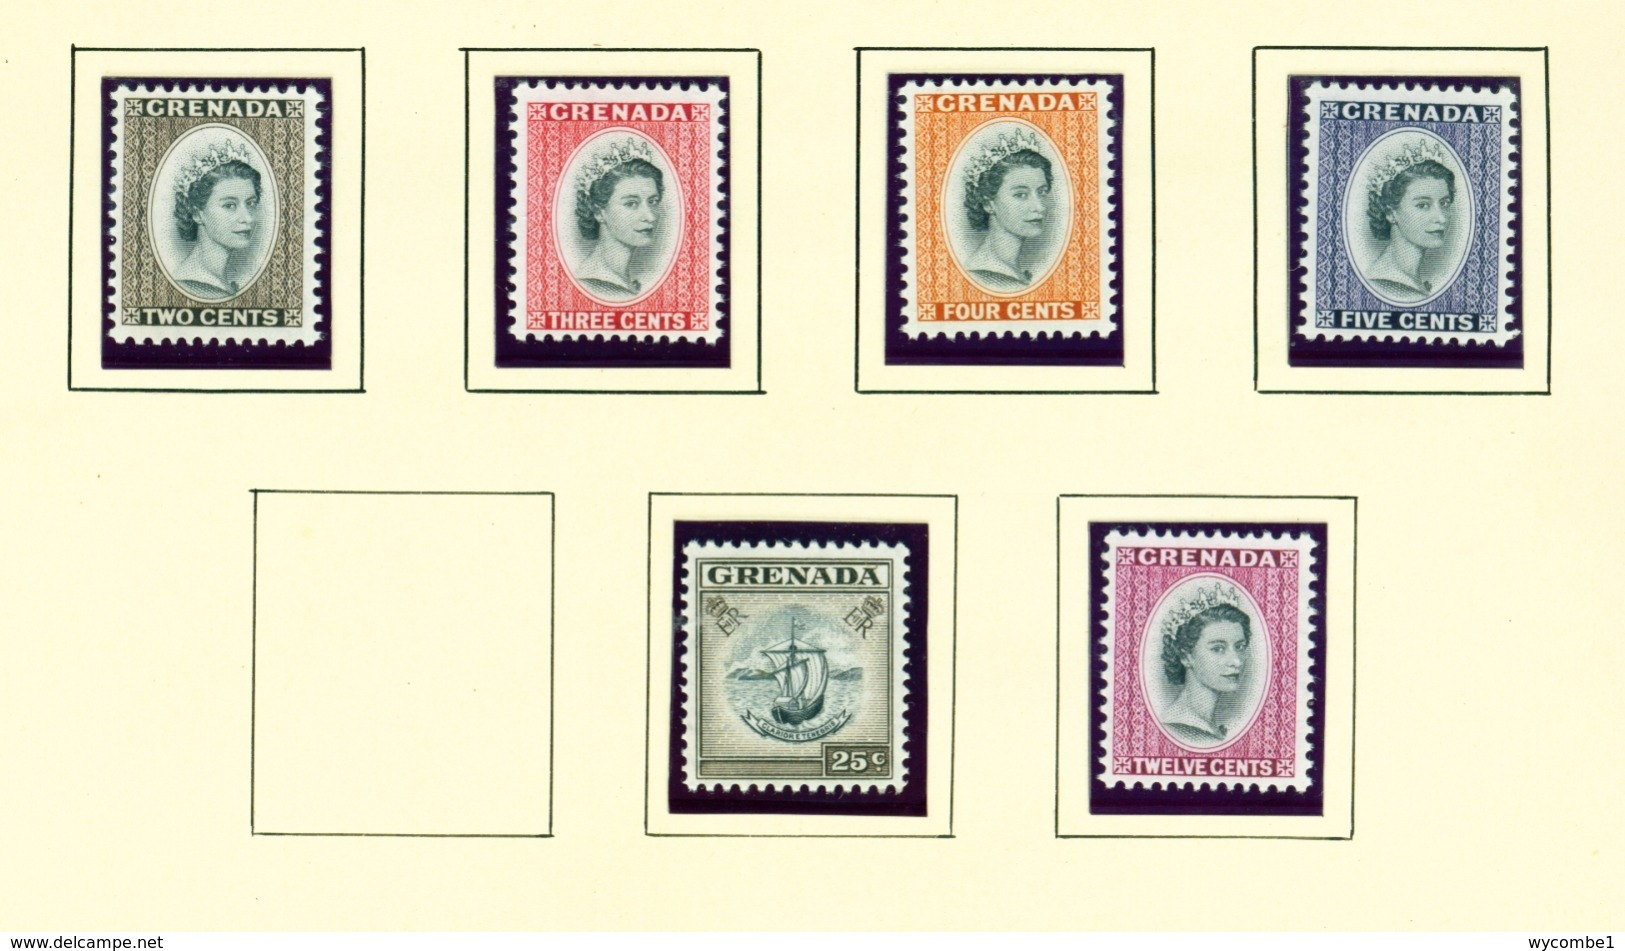 GRENADA - 1964 Definitives Watermark Mult St Edwards Crown CA Set Unmounted/Never Hinged Mint - Grenade (...-1974)